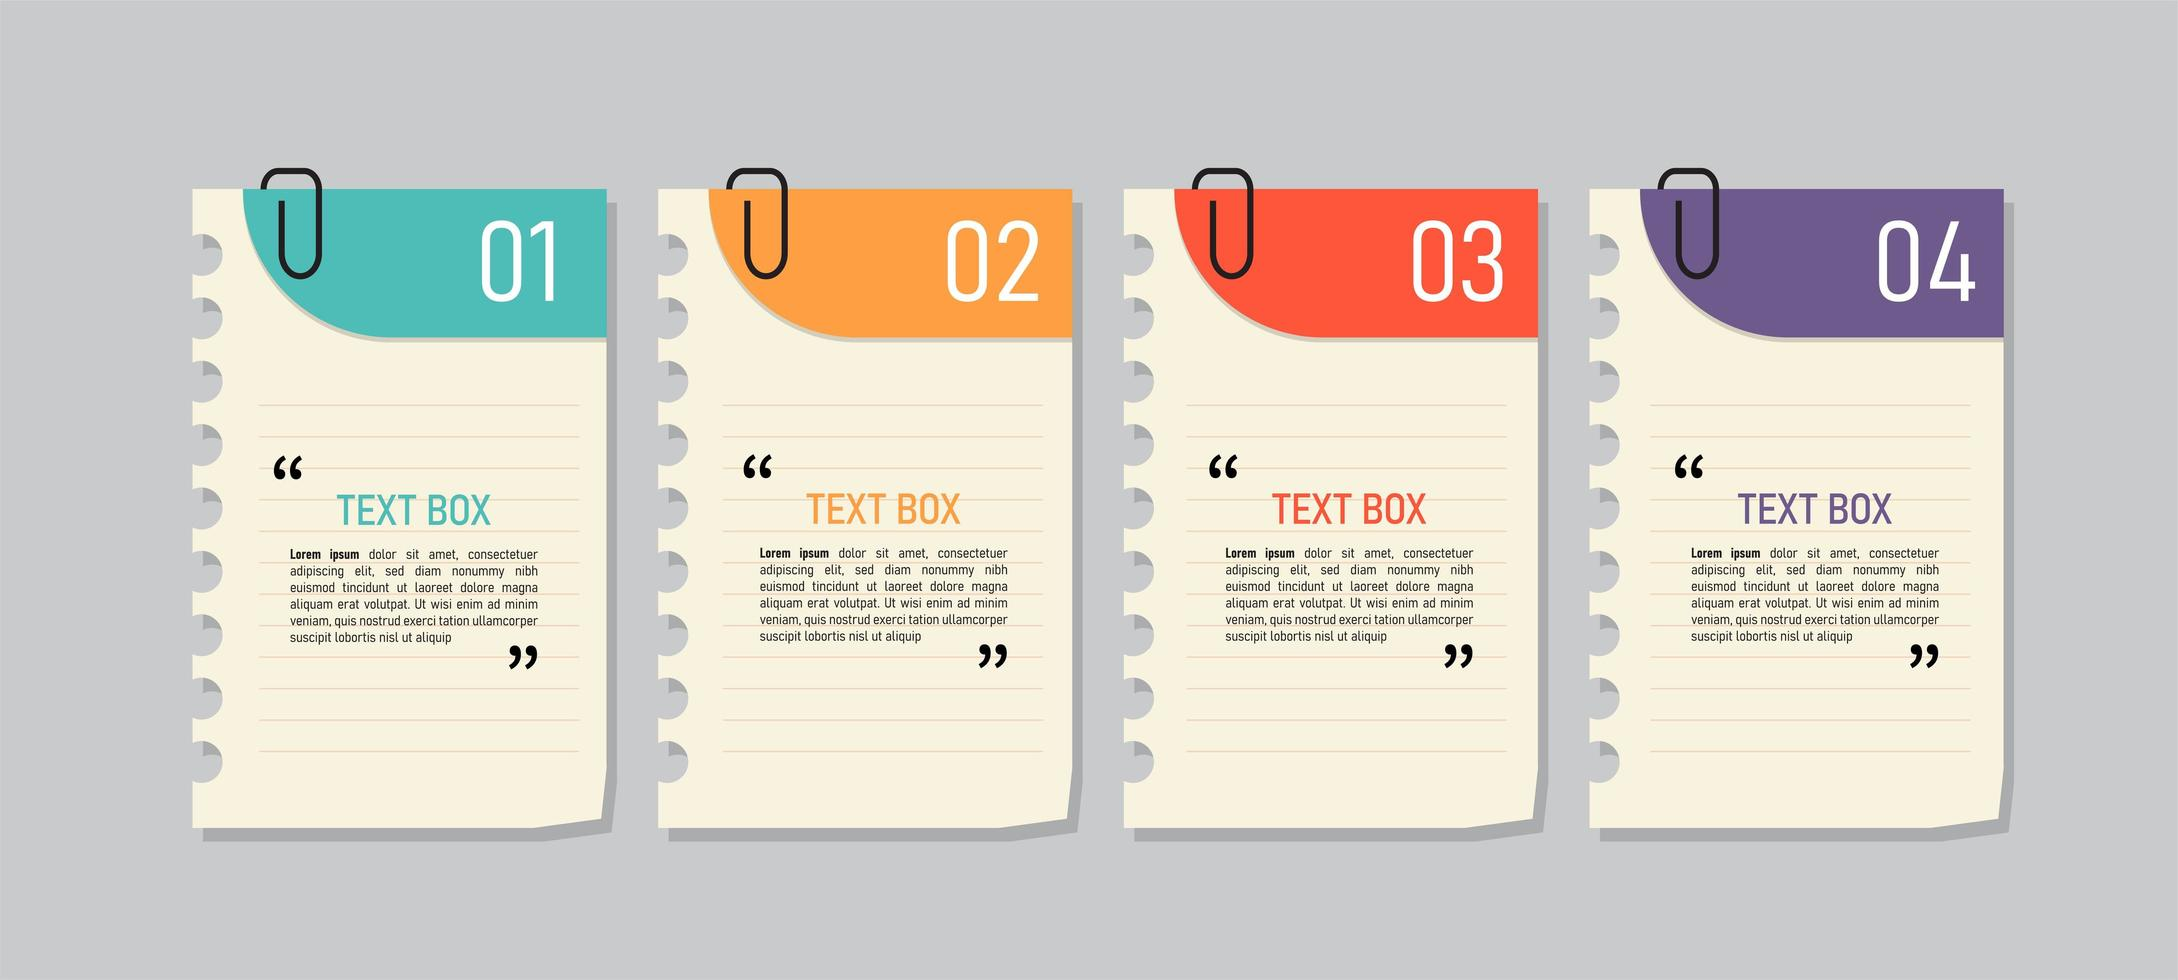 bunte Papier Notizen Icon Set vektor